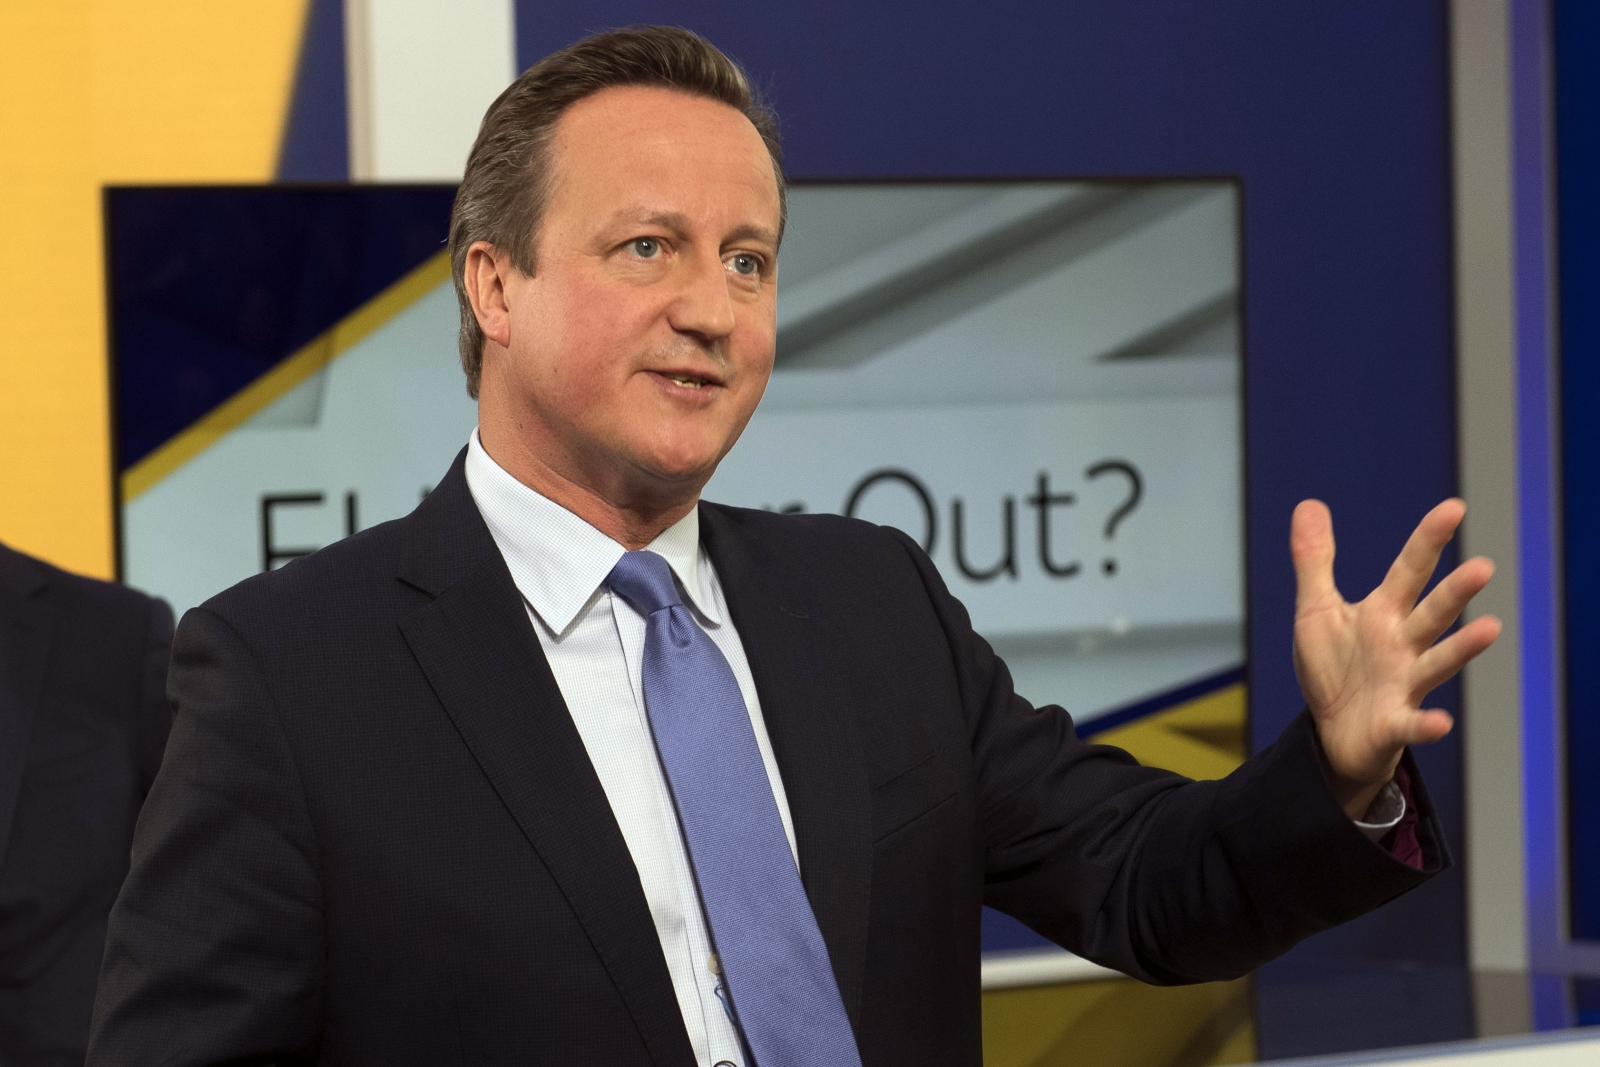 David Cameron ITV EU Referendum Speech